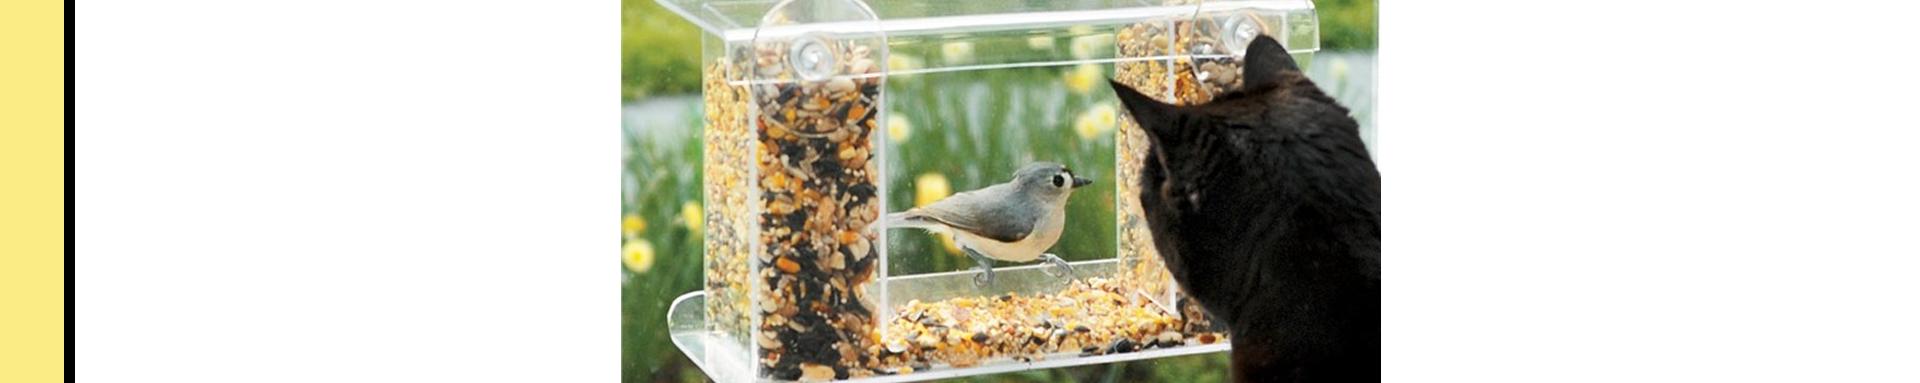 peak-a-boo bird feeder